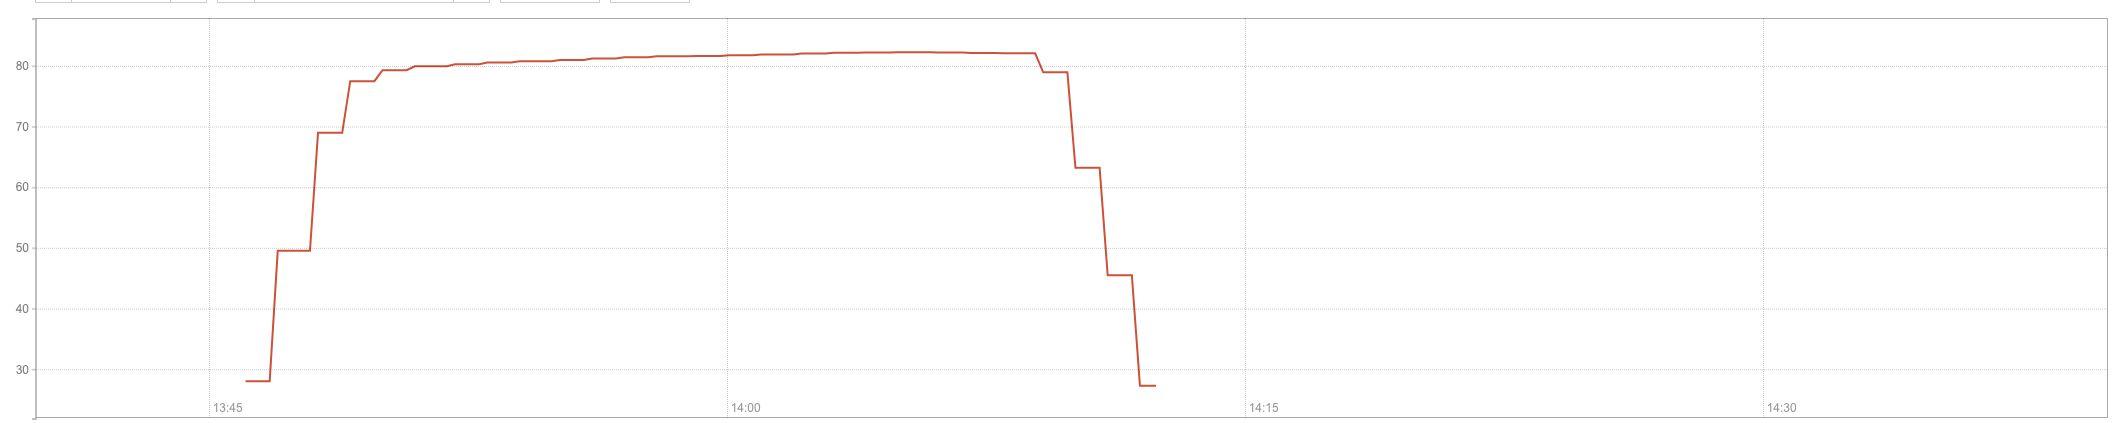 <strong>中间件_数据库实验报告_高性价比</strong>